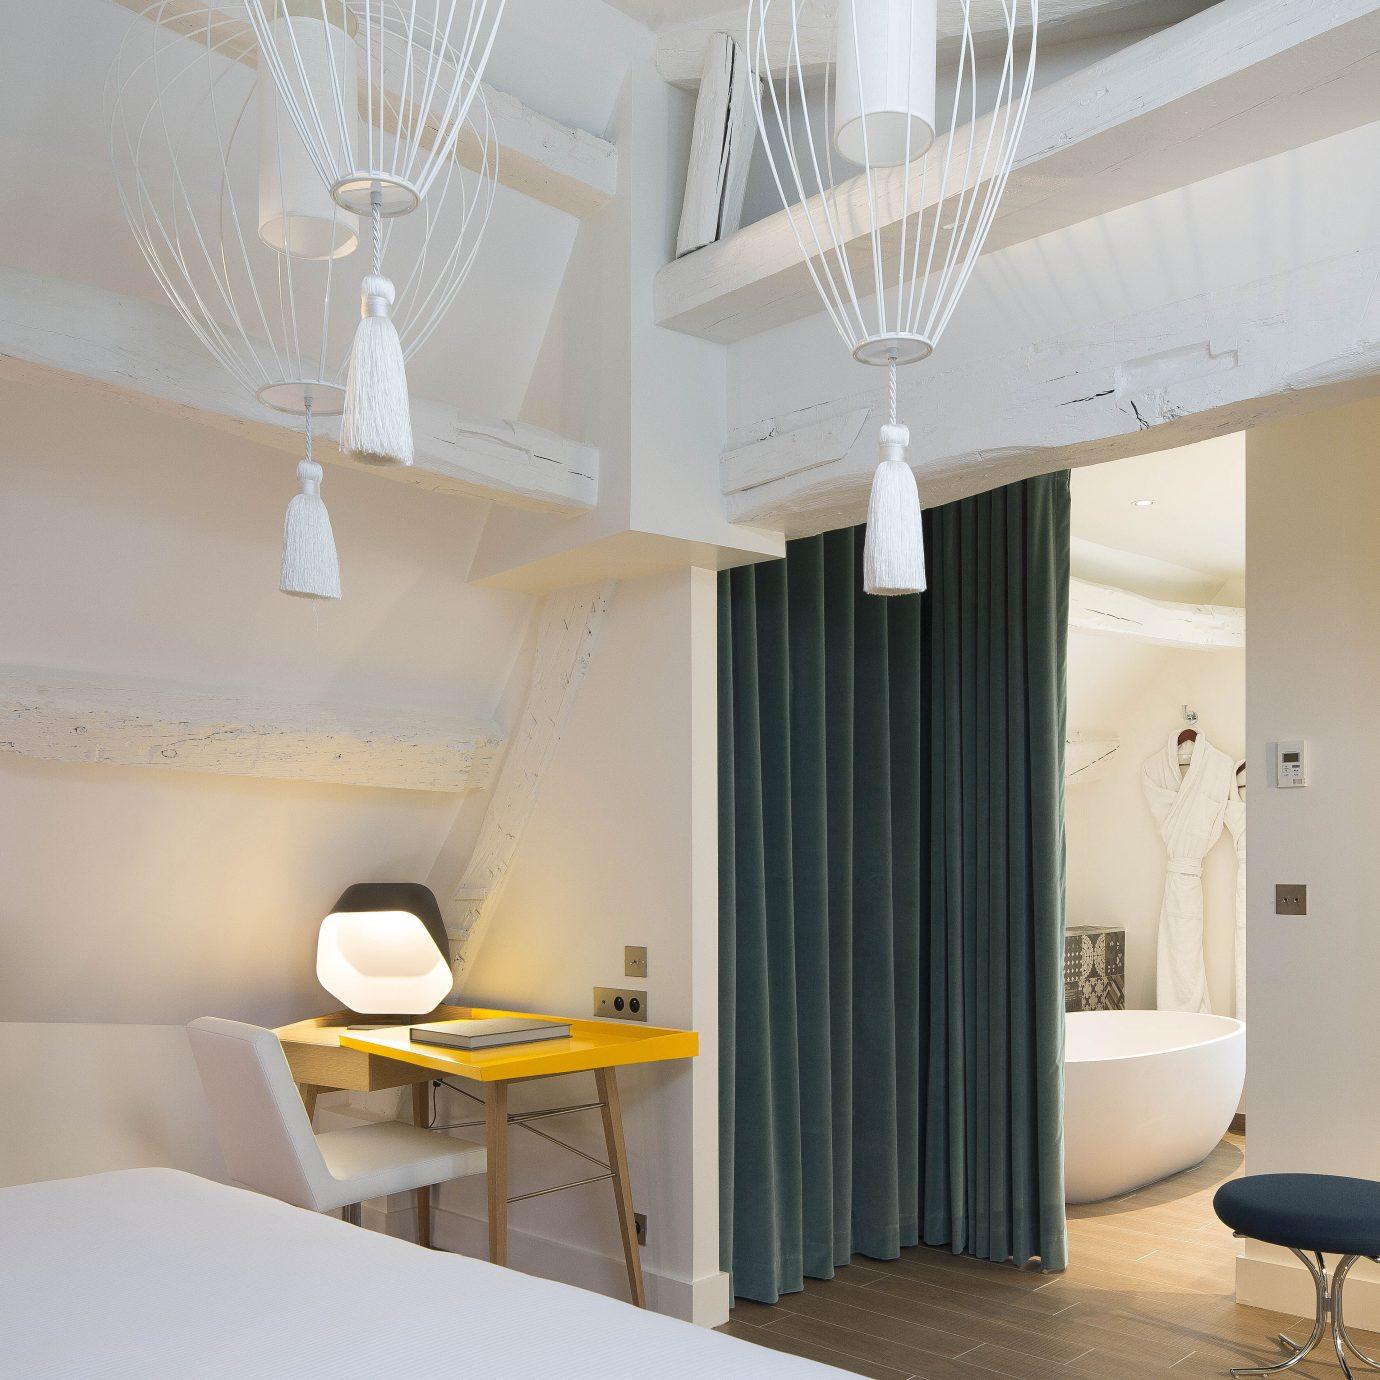 Bath Bedroom Boutique City Elegant Hotels Modern Romance Trip Ideas property home lighting condominium Suite daylighting